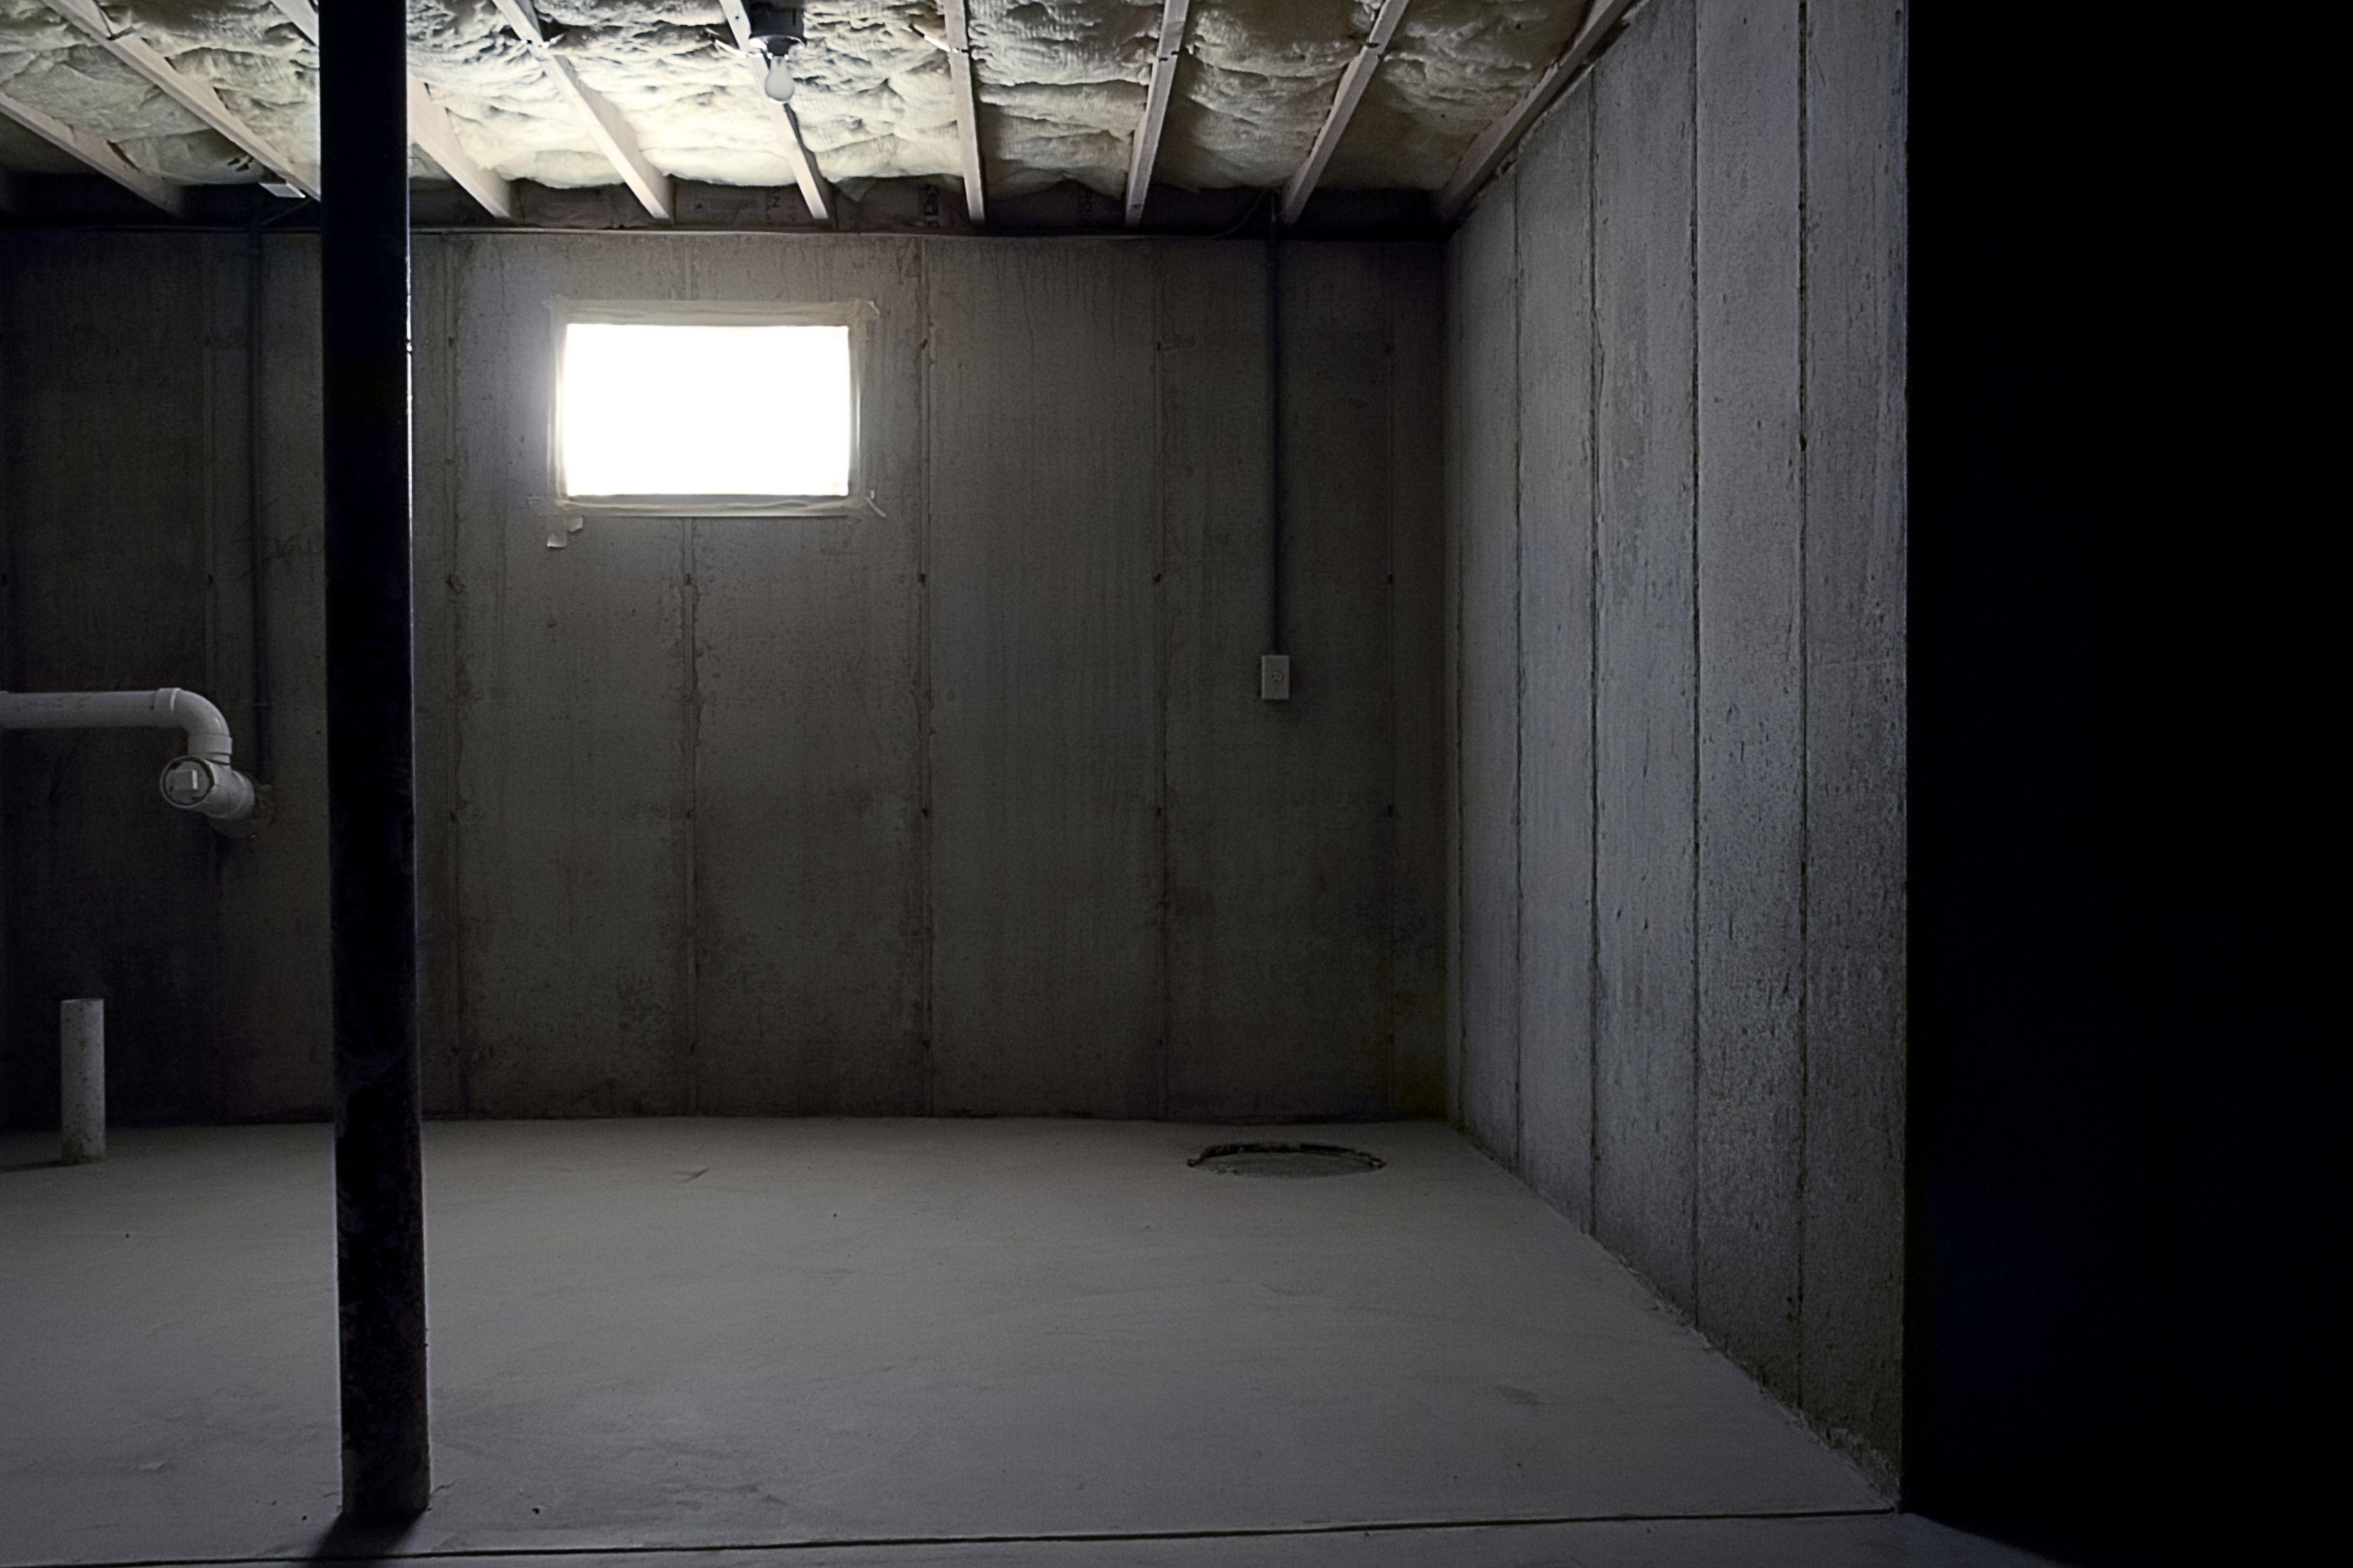 Basement wall ideas 2 nice ideas basement scene ideas for Nice basements